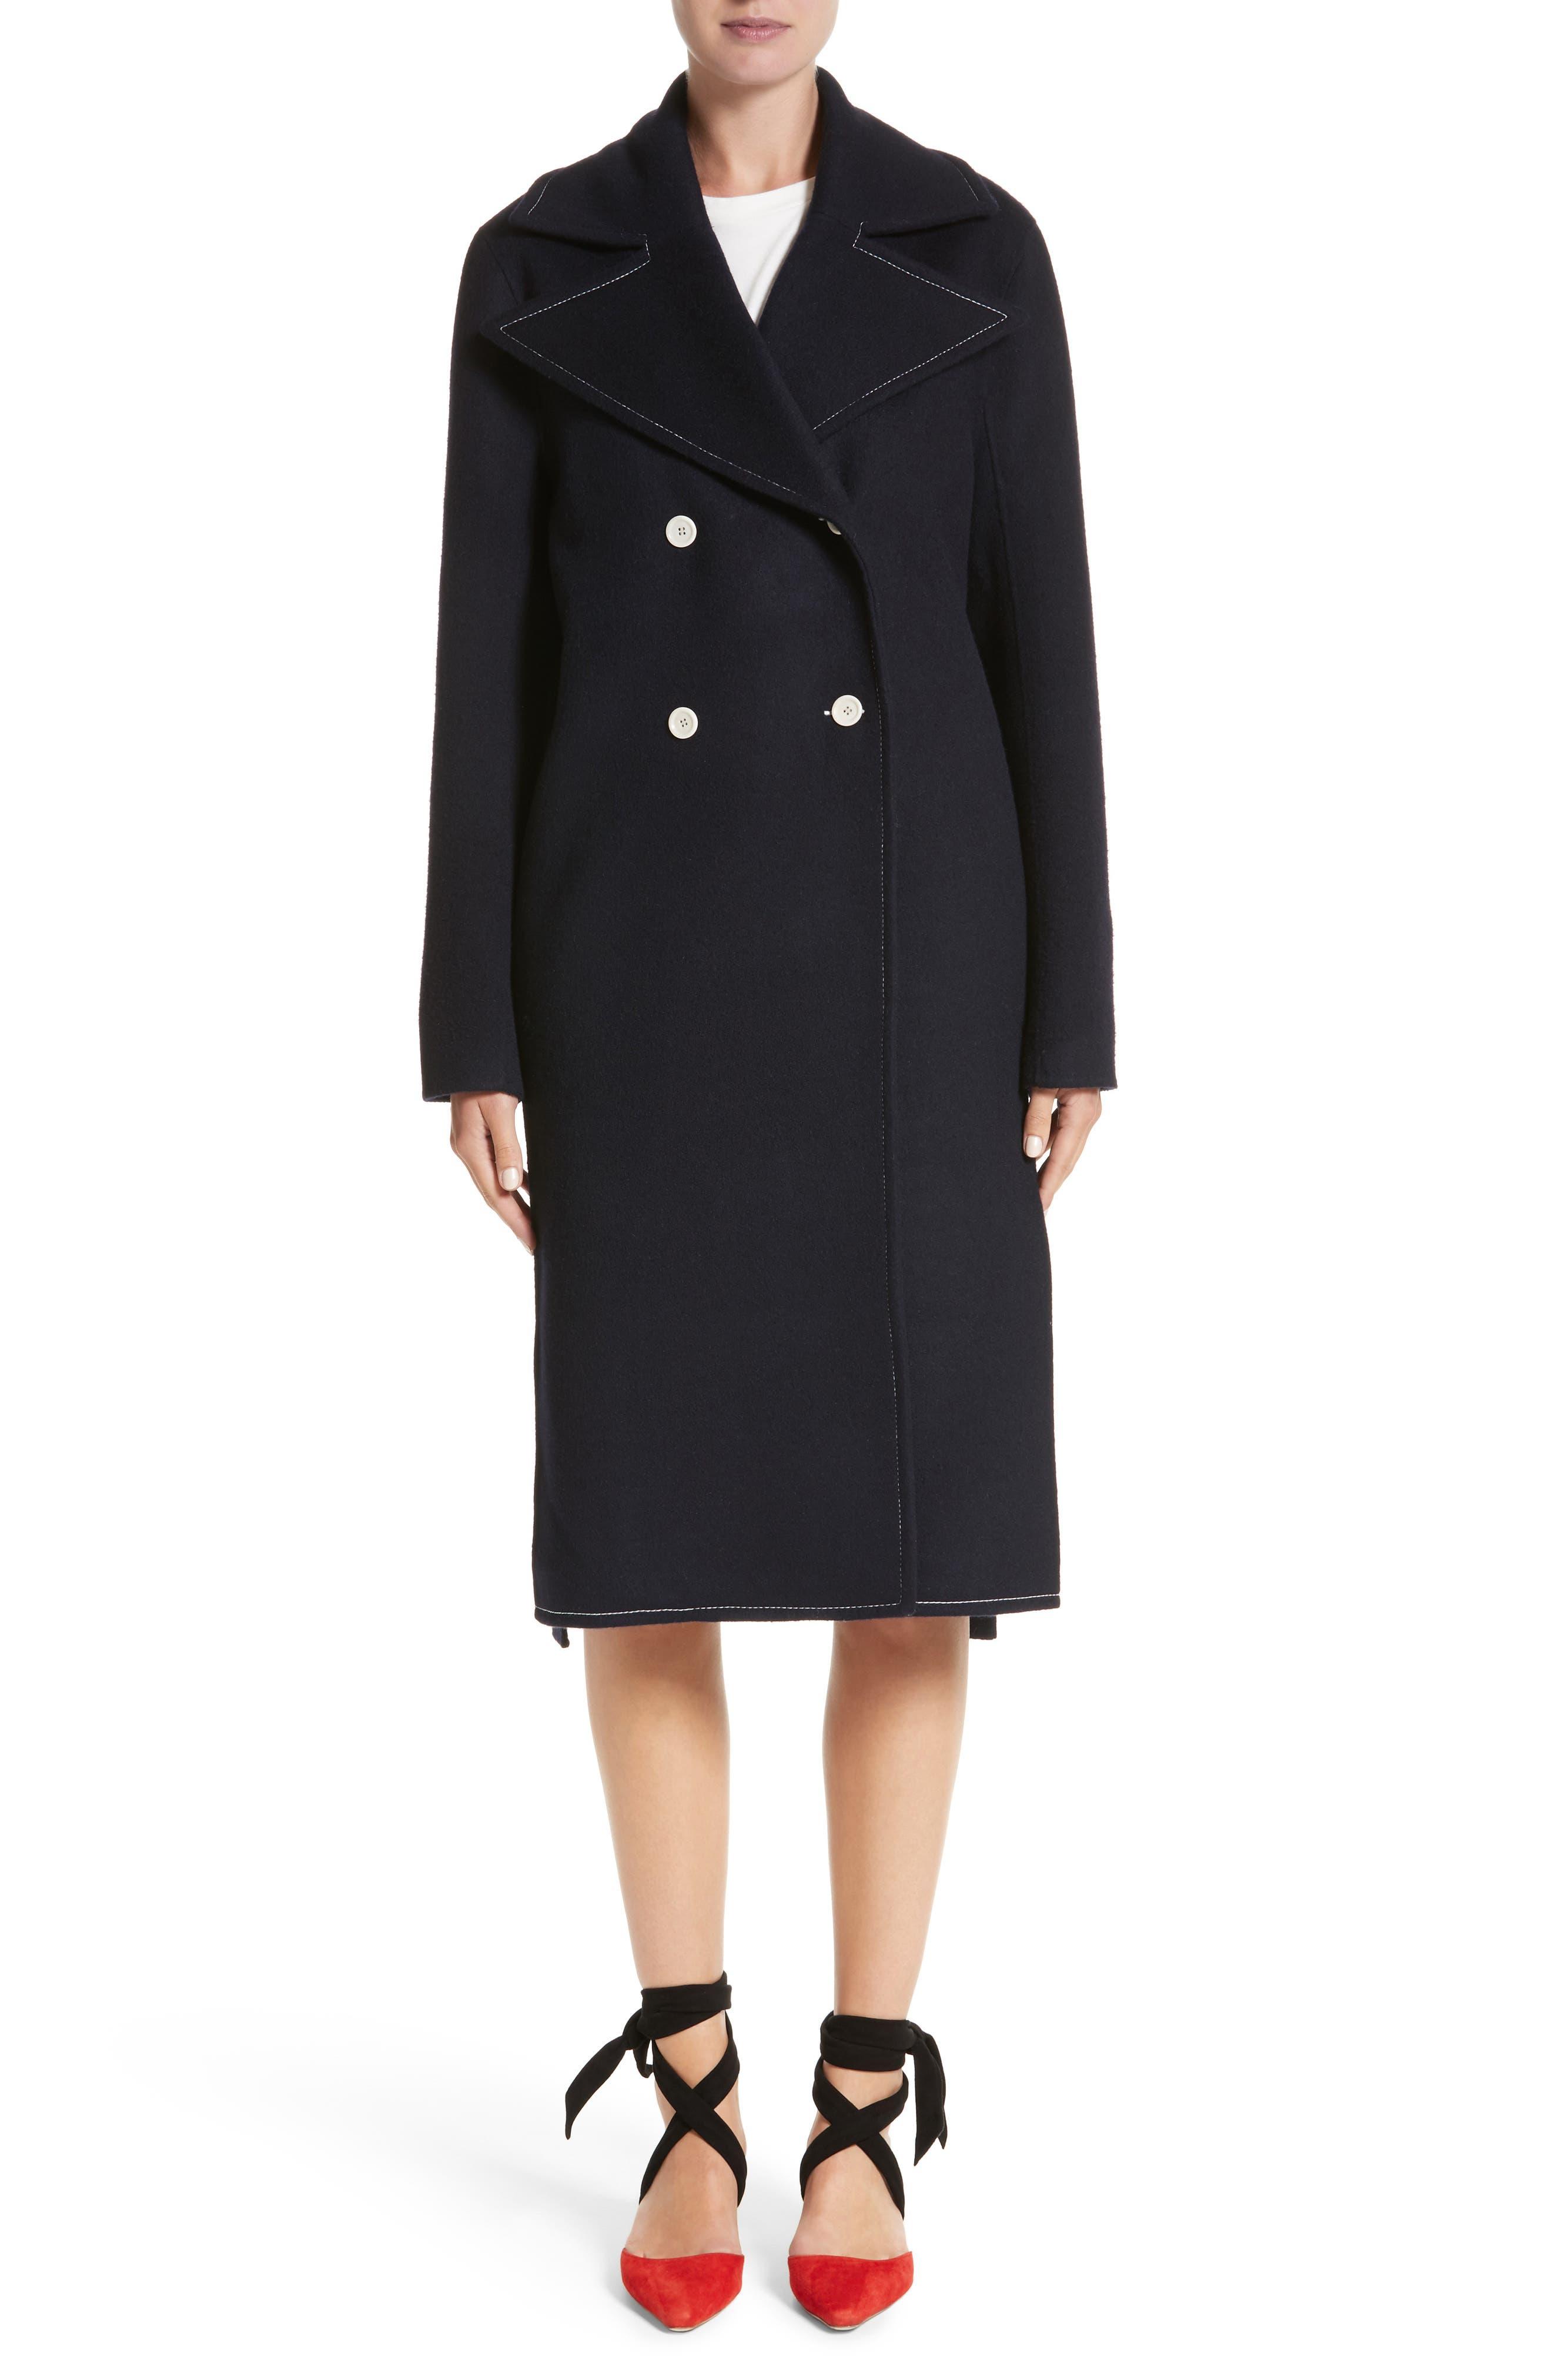 Rejina Pyo Double Breasted Wool Blend Coat